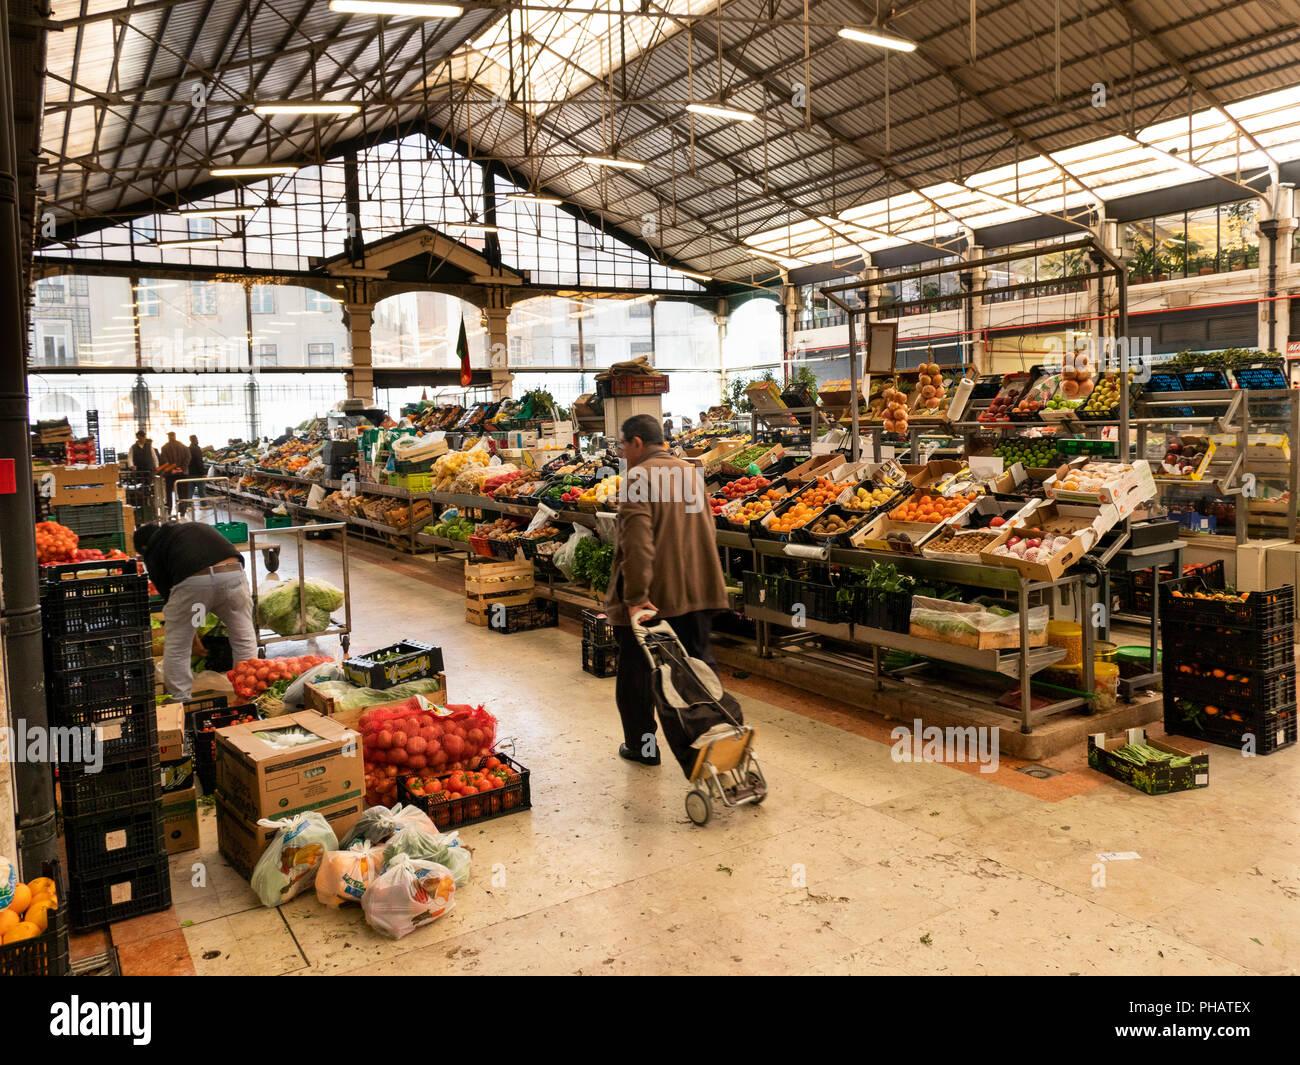 Portugal, Lisbon, Avenida 24 de Julho, Mercado da Ribera, Ribera Market, fresh fruit and vegetable traders Stock Photo